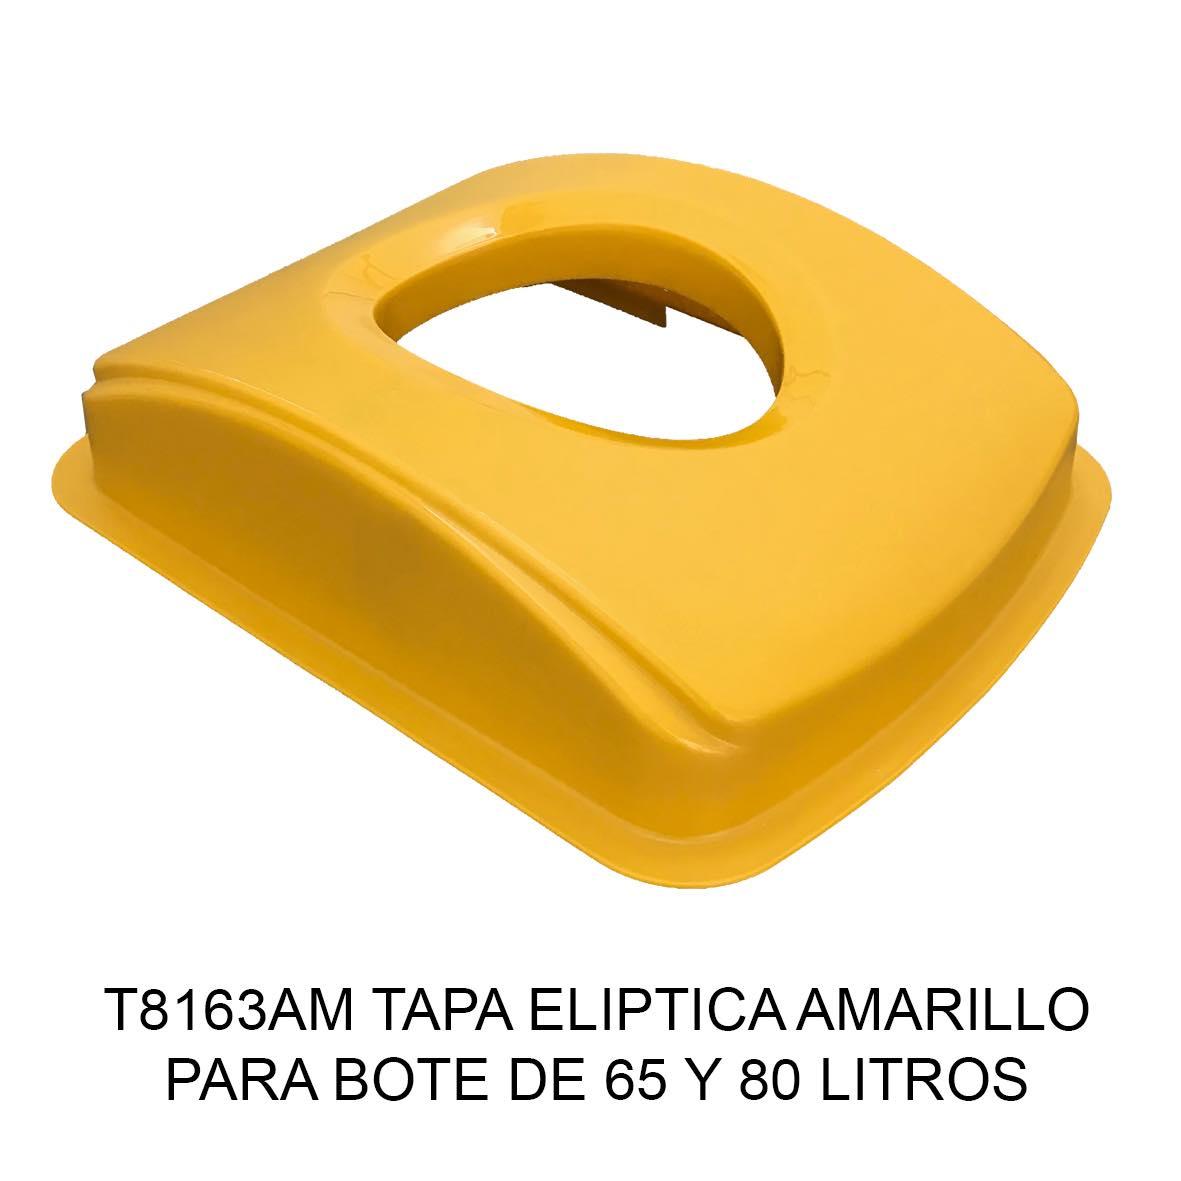 Tapa elÍptica para bote de basura color amarillo para botes de 65 y 80 litros Modelo T8163AM de Sablón